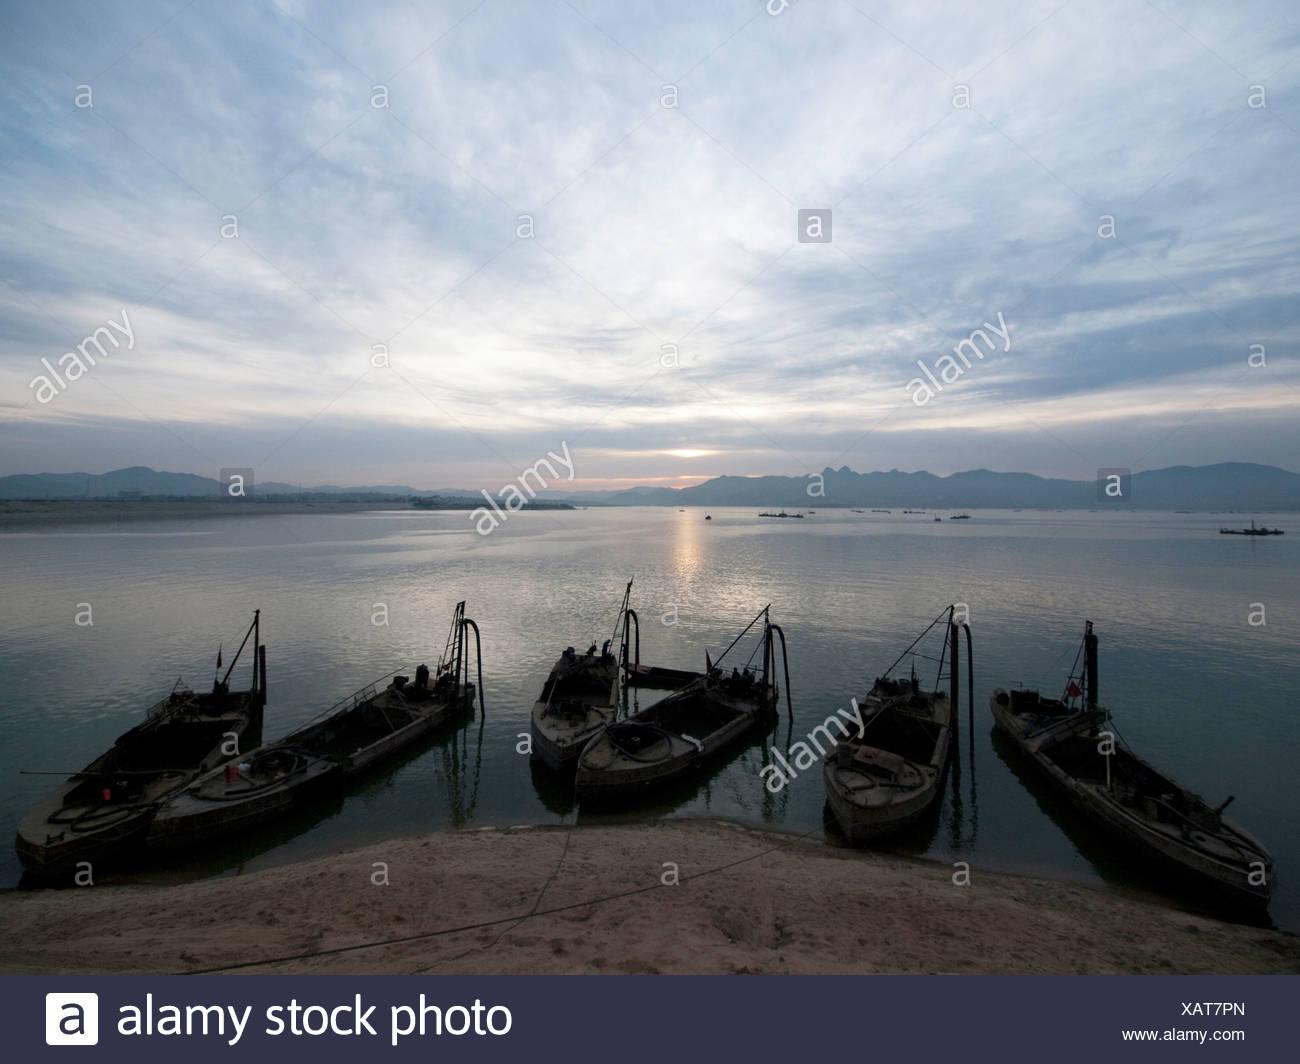 Fishing boats floating on the East China Sea, Qingdao, Shandong , China - Stock Image